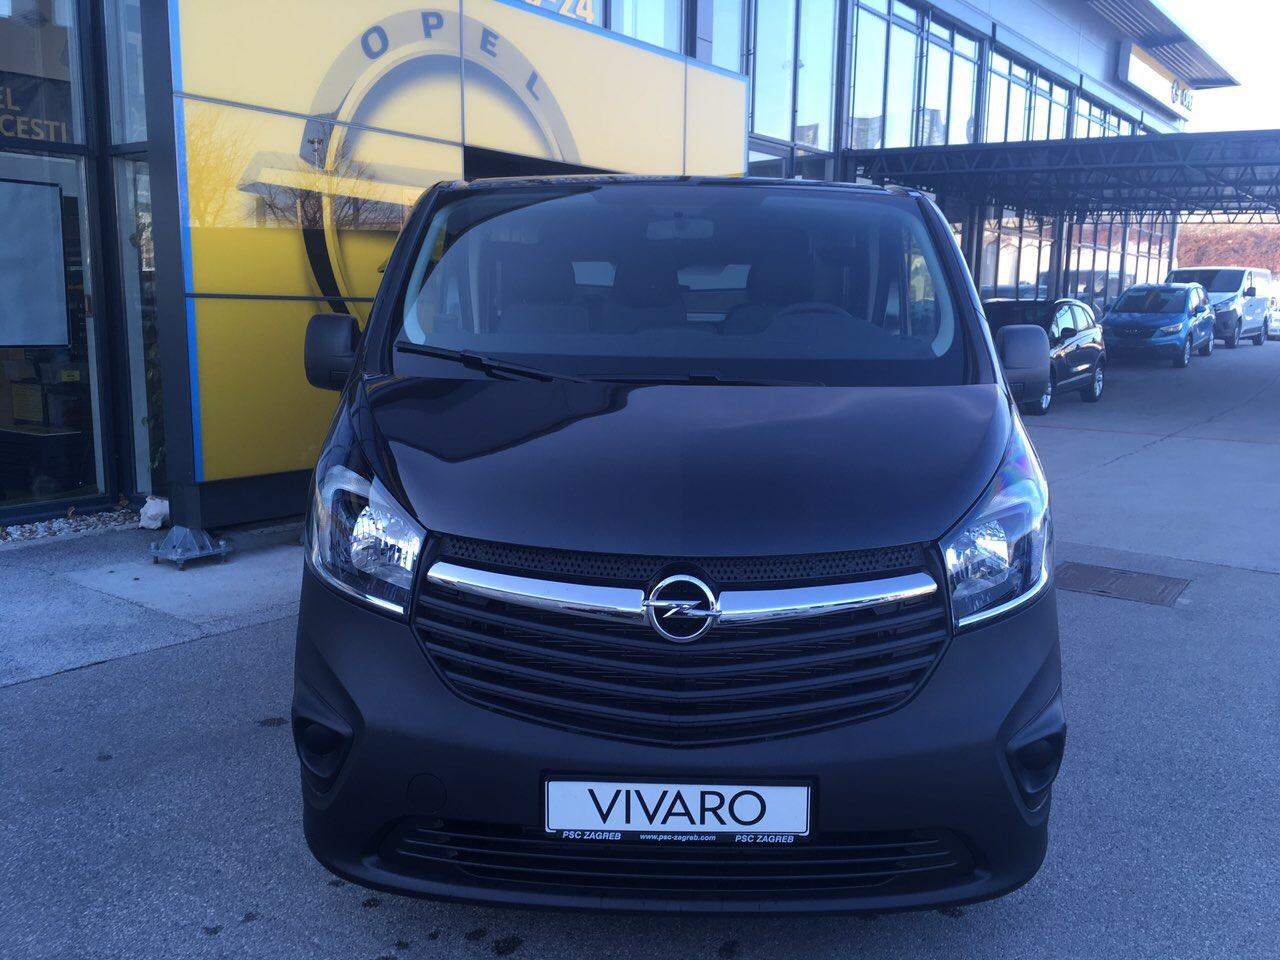 Opel Vivaro Van L2H1 1.6 CDTI 89 kw - Pogrebno vozilo - 7 godina garancije!